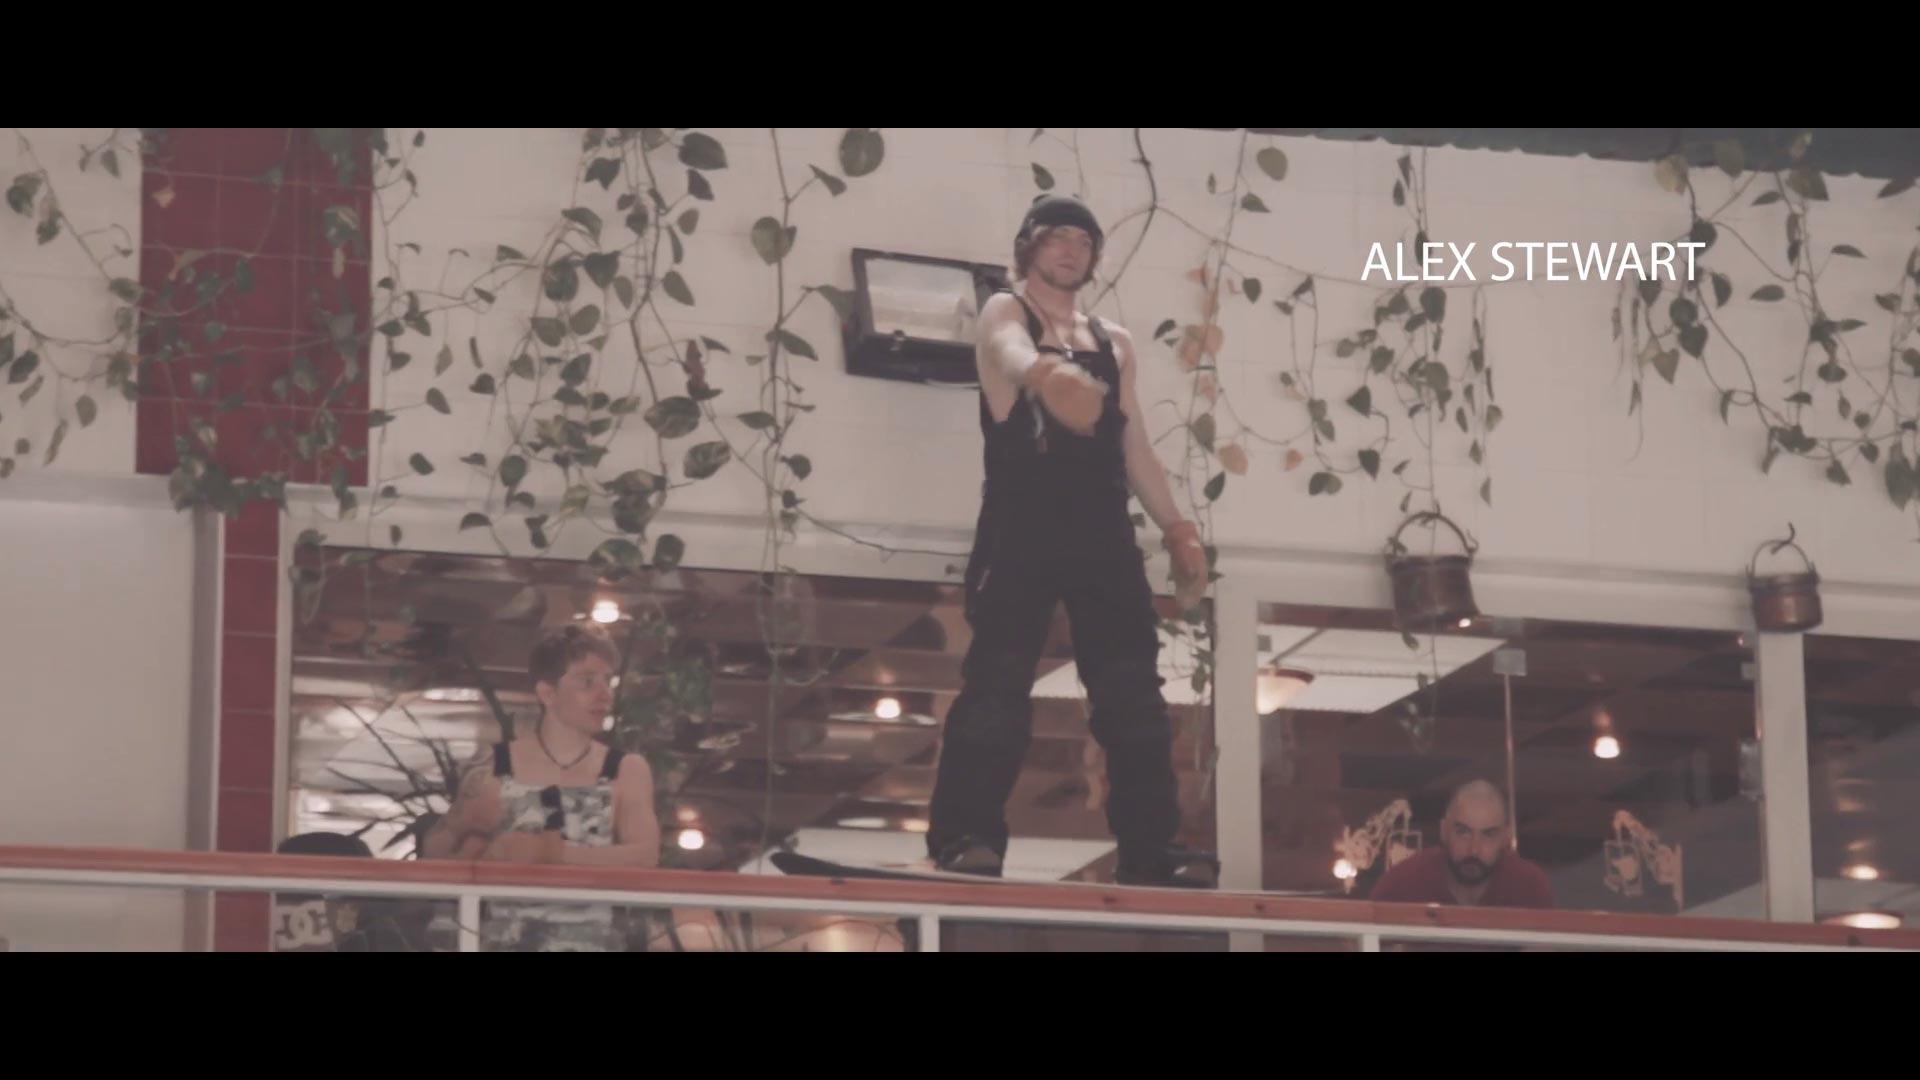 Rusty Toothbrush - The Box: Mit dem Board vom Balkon in den Pool!